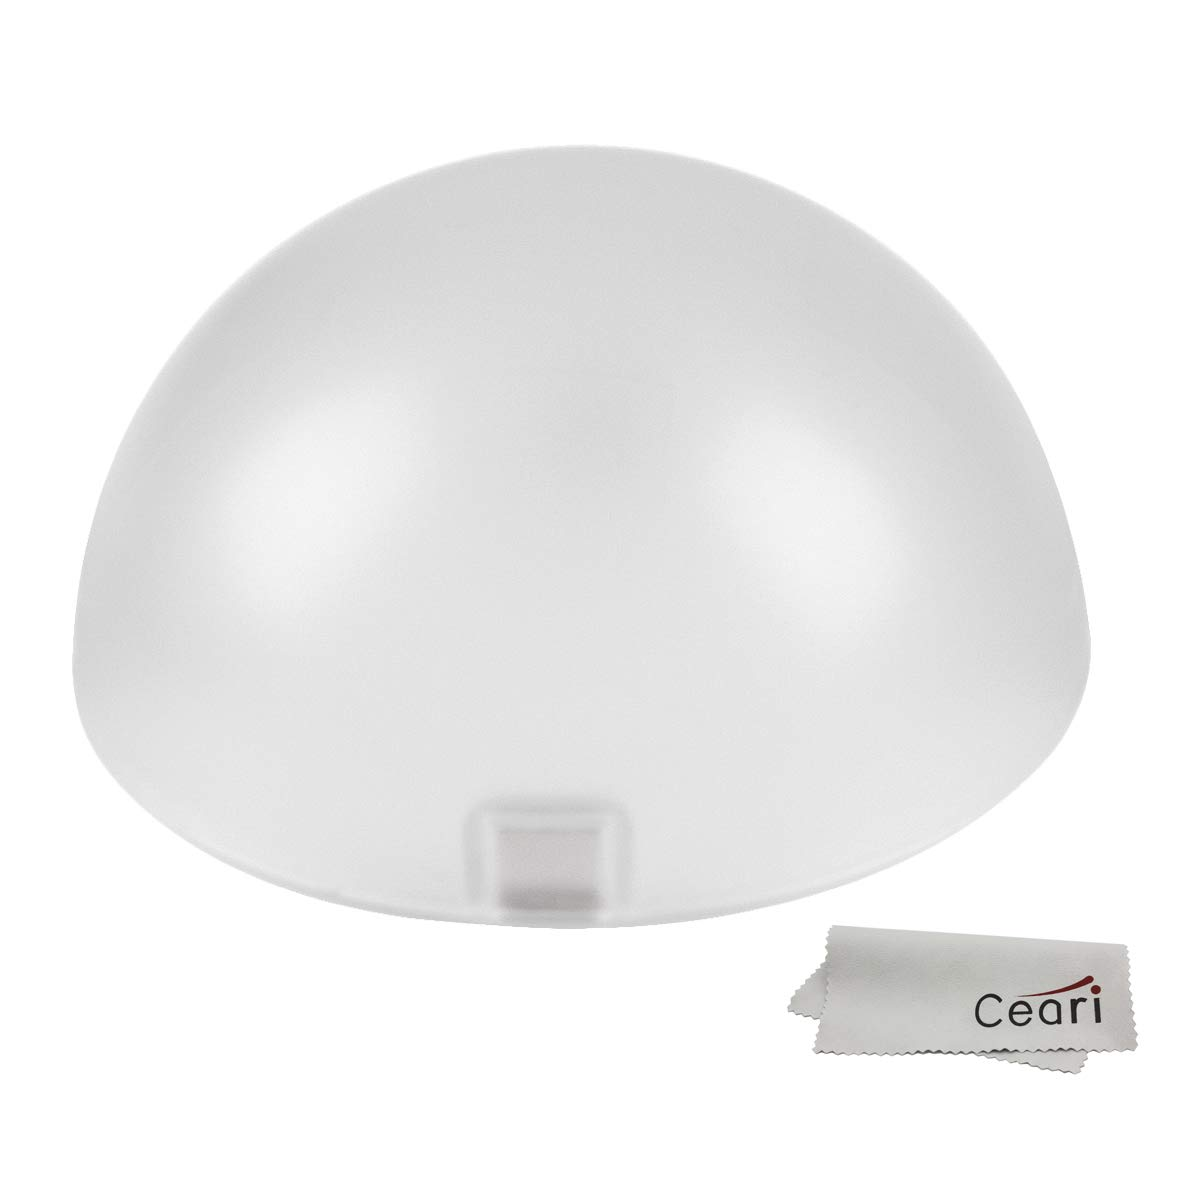 Godox AK-R11 Dome Diffuser, Compatible with Godox V1 Flash Series, V1-S, V1-C, V-1N, use with Godox H200R Round Flash Head, AD200 Pro, AD200 by Godox